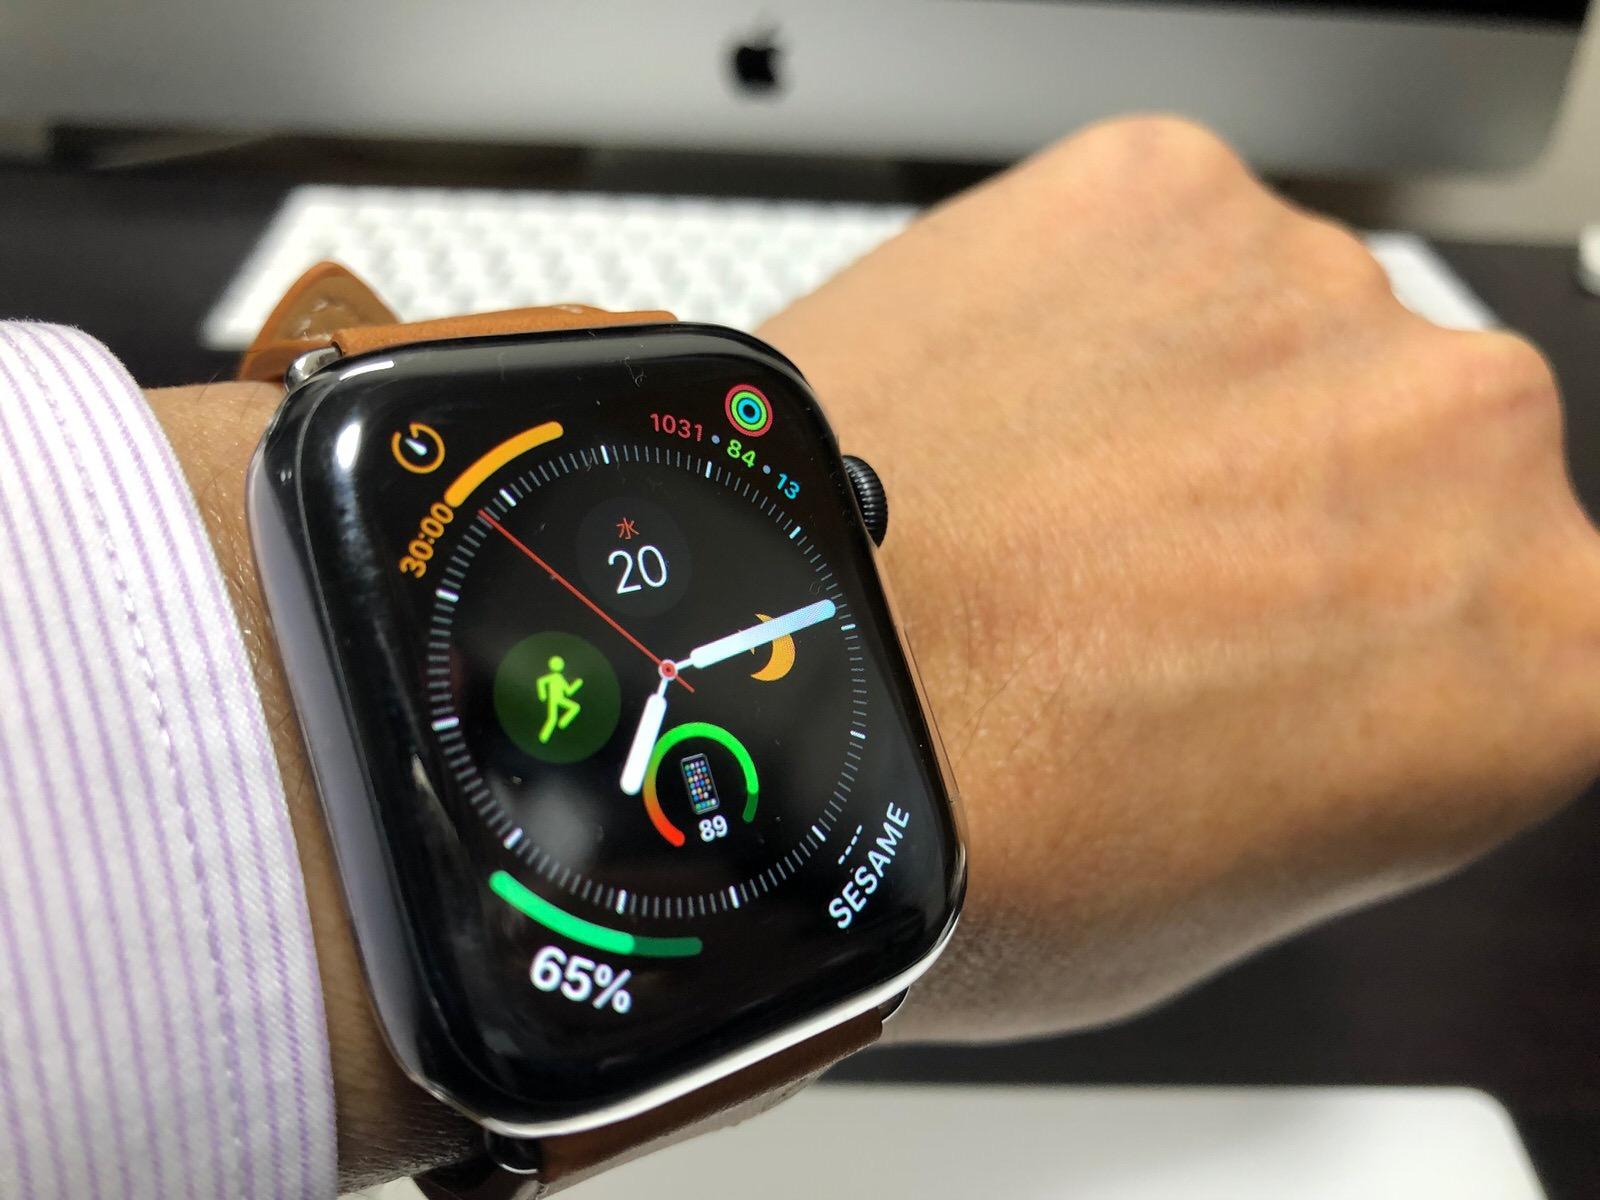 casualcatch Apple watch4 ケース 保護ケース カバー PCケース 傷を防止 防塵 耐衝撃性 44mm-6